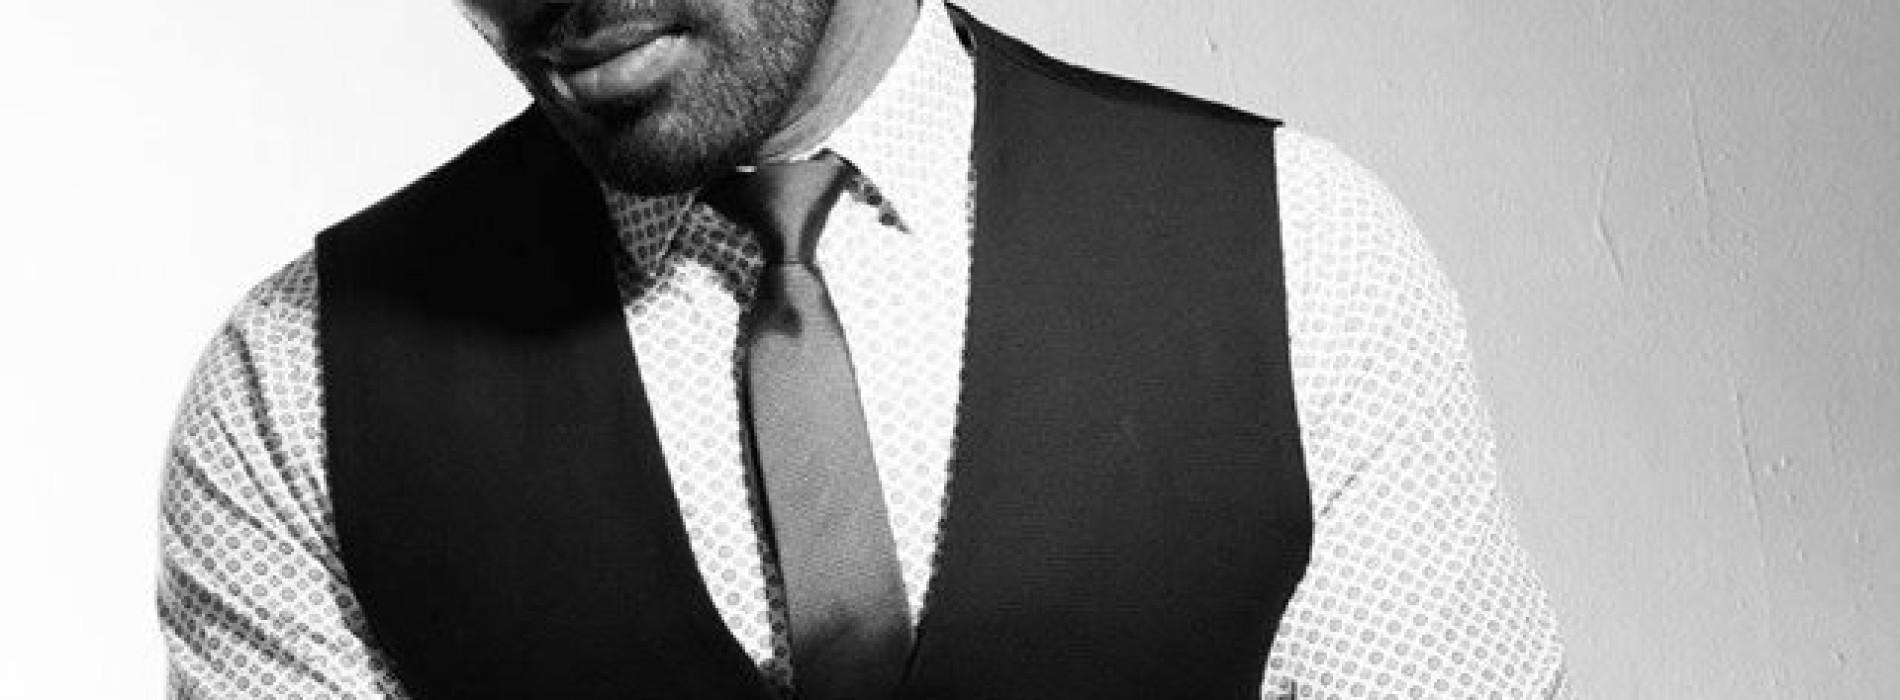 Shehan Somaratna Has His Debut Video Announcement